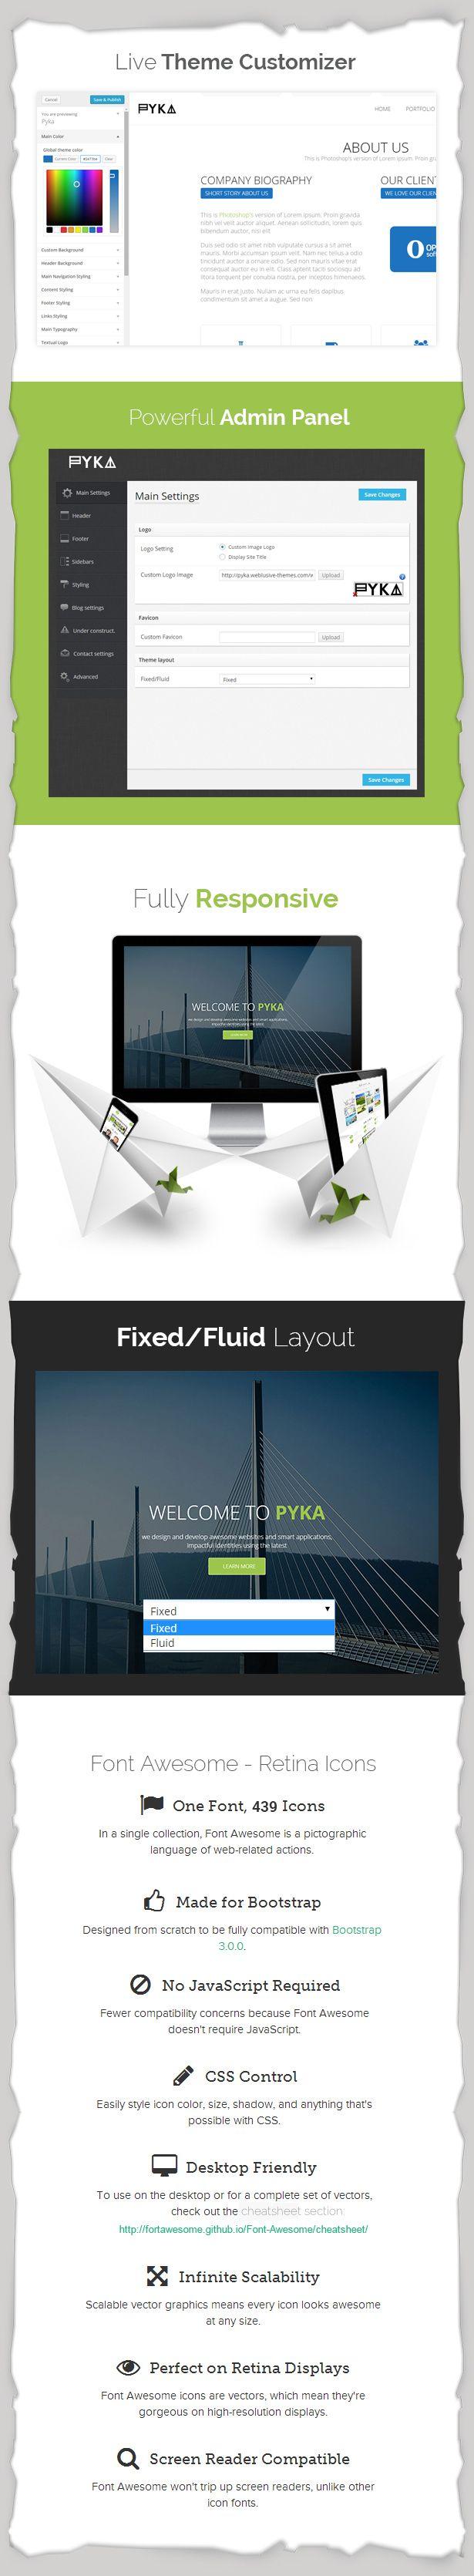 WordPress - Pyka - Single Page WordPress Theme | ThemeForest